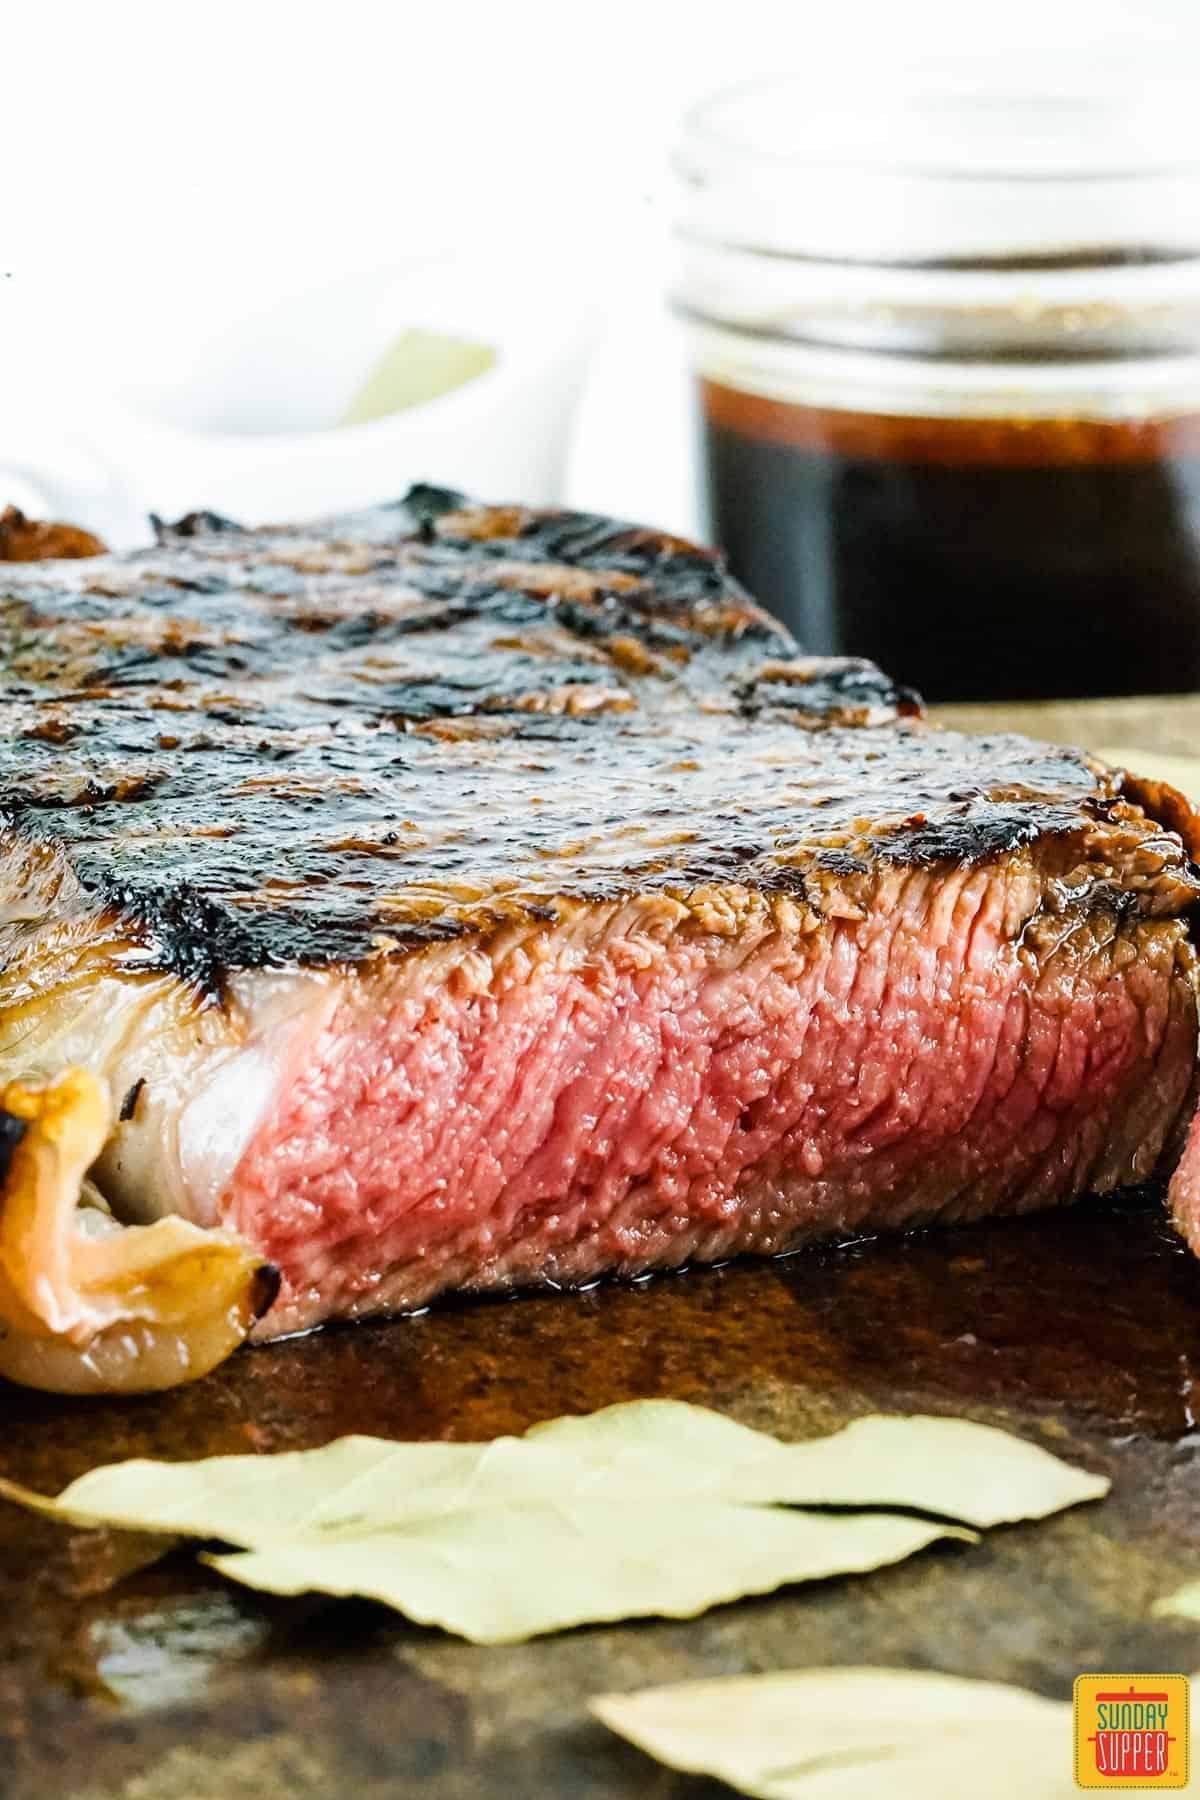 Grilled steak sliced on a cutting board